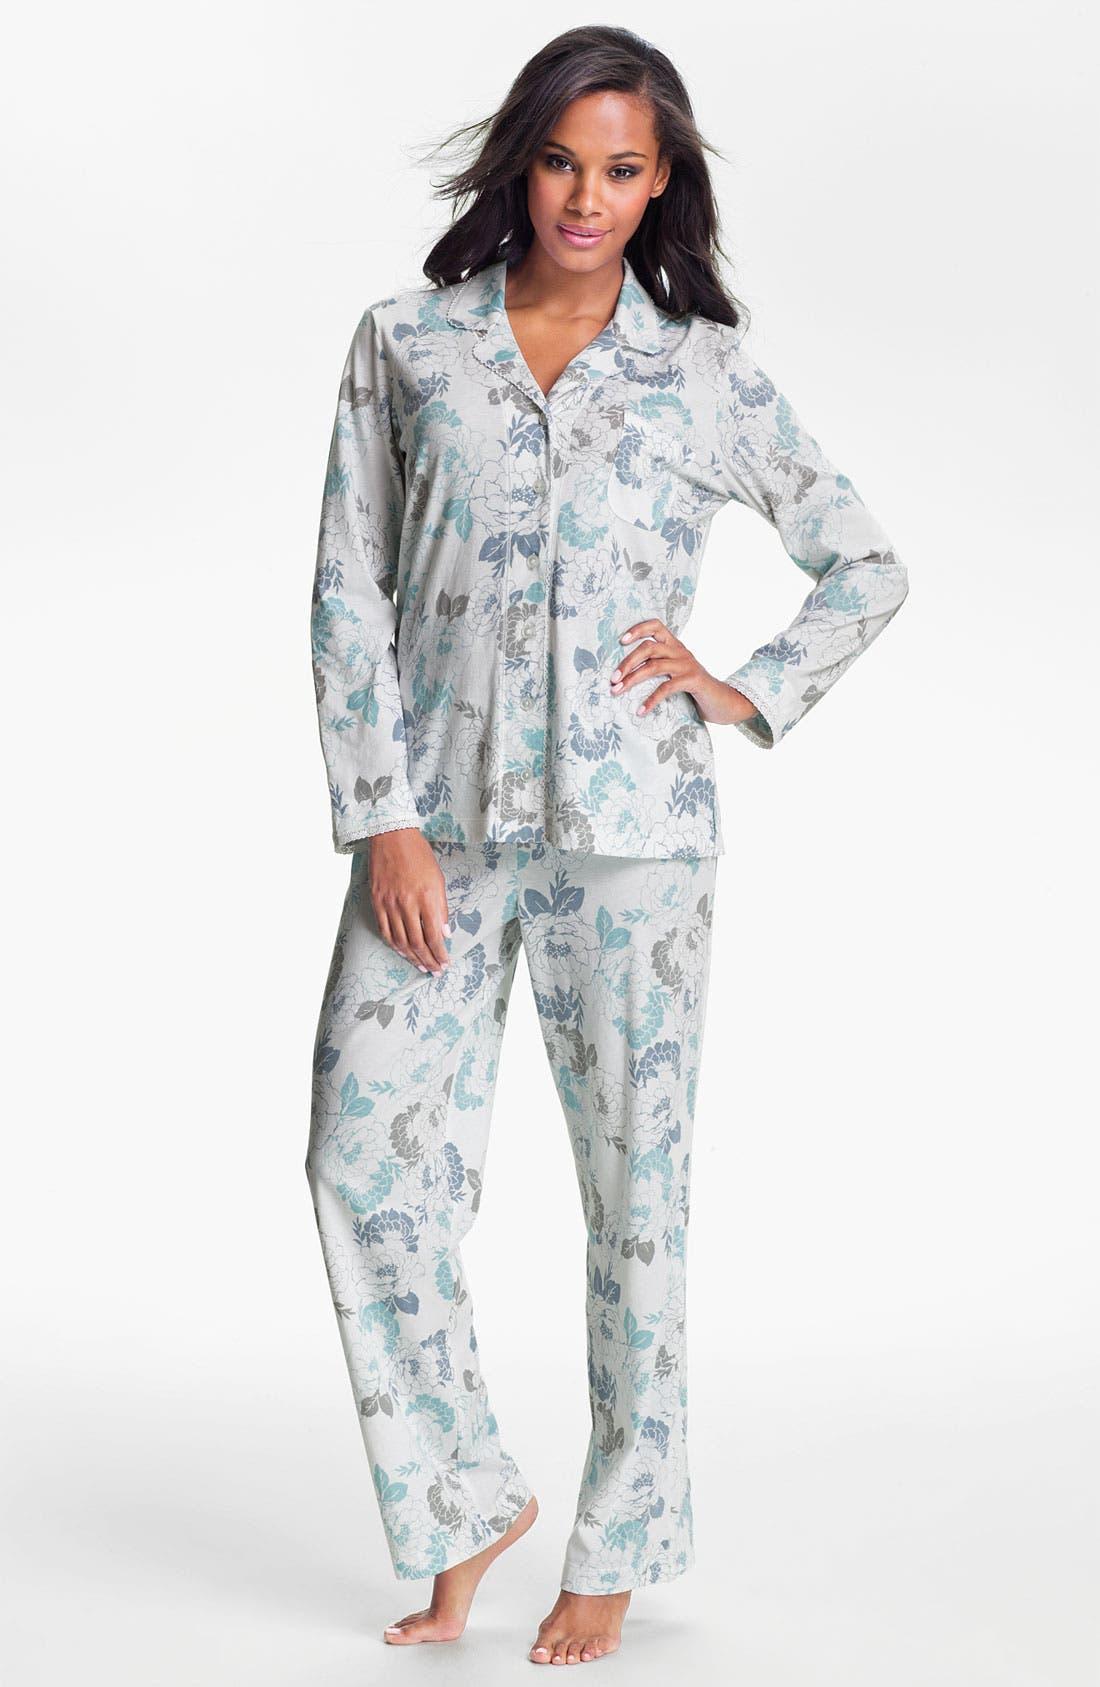 Alternate Image 1 Selected - Carole Hochman Designs 'Airbrushed Floral' Pajamas